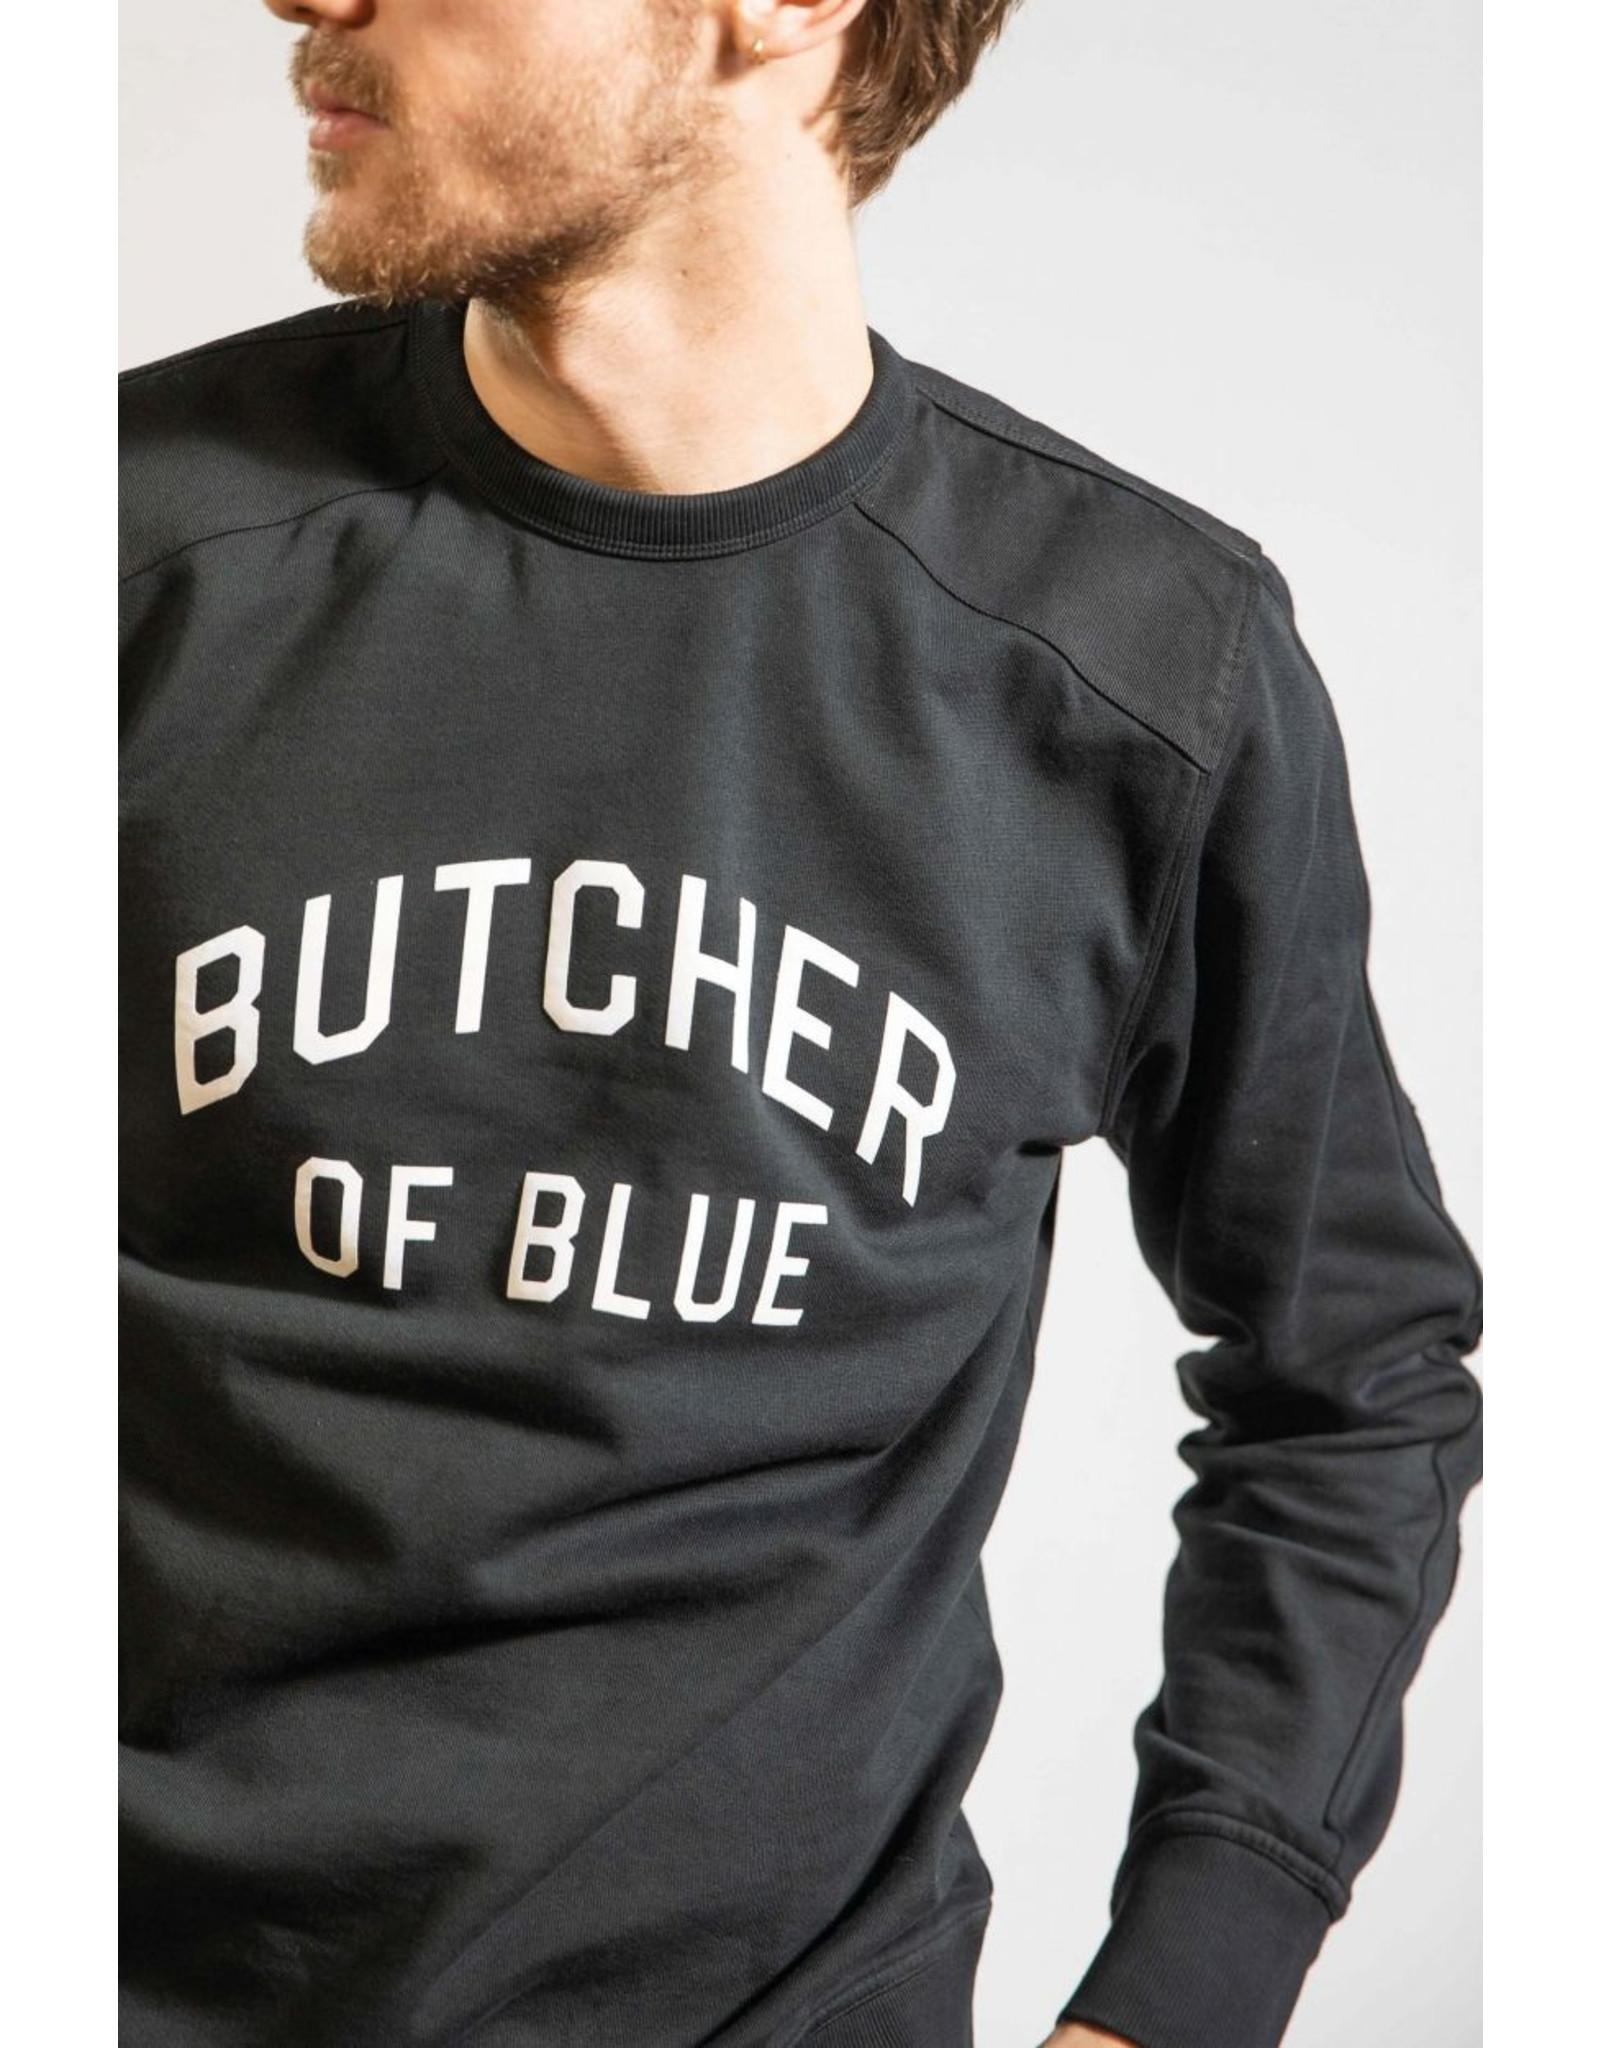 Butcher of Blue Peck line crew sweat l/s